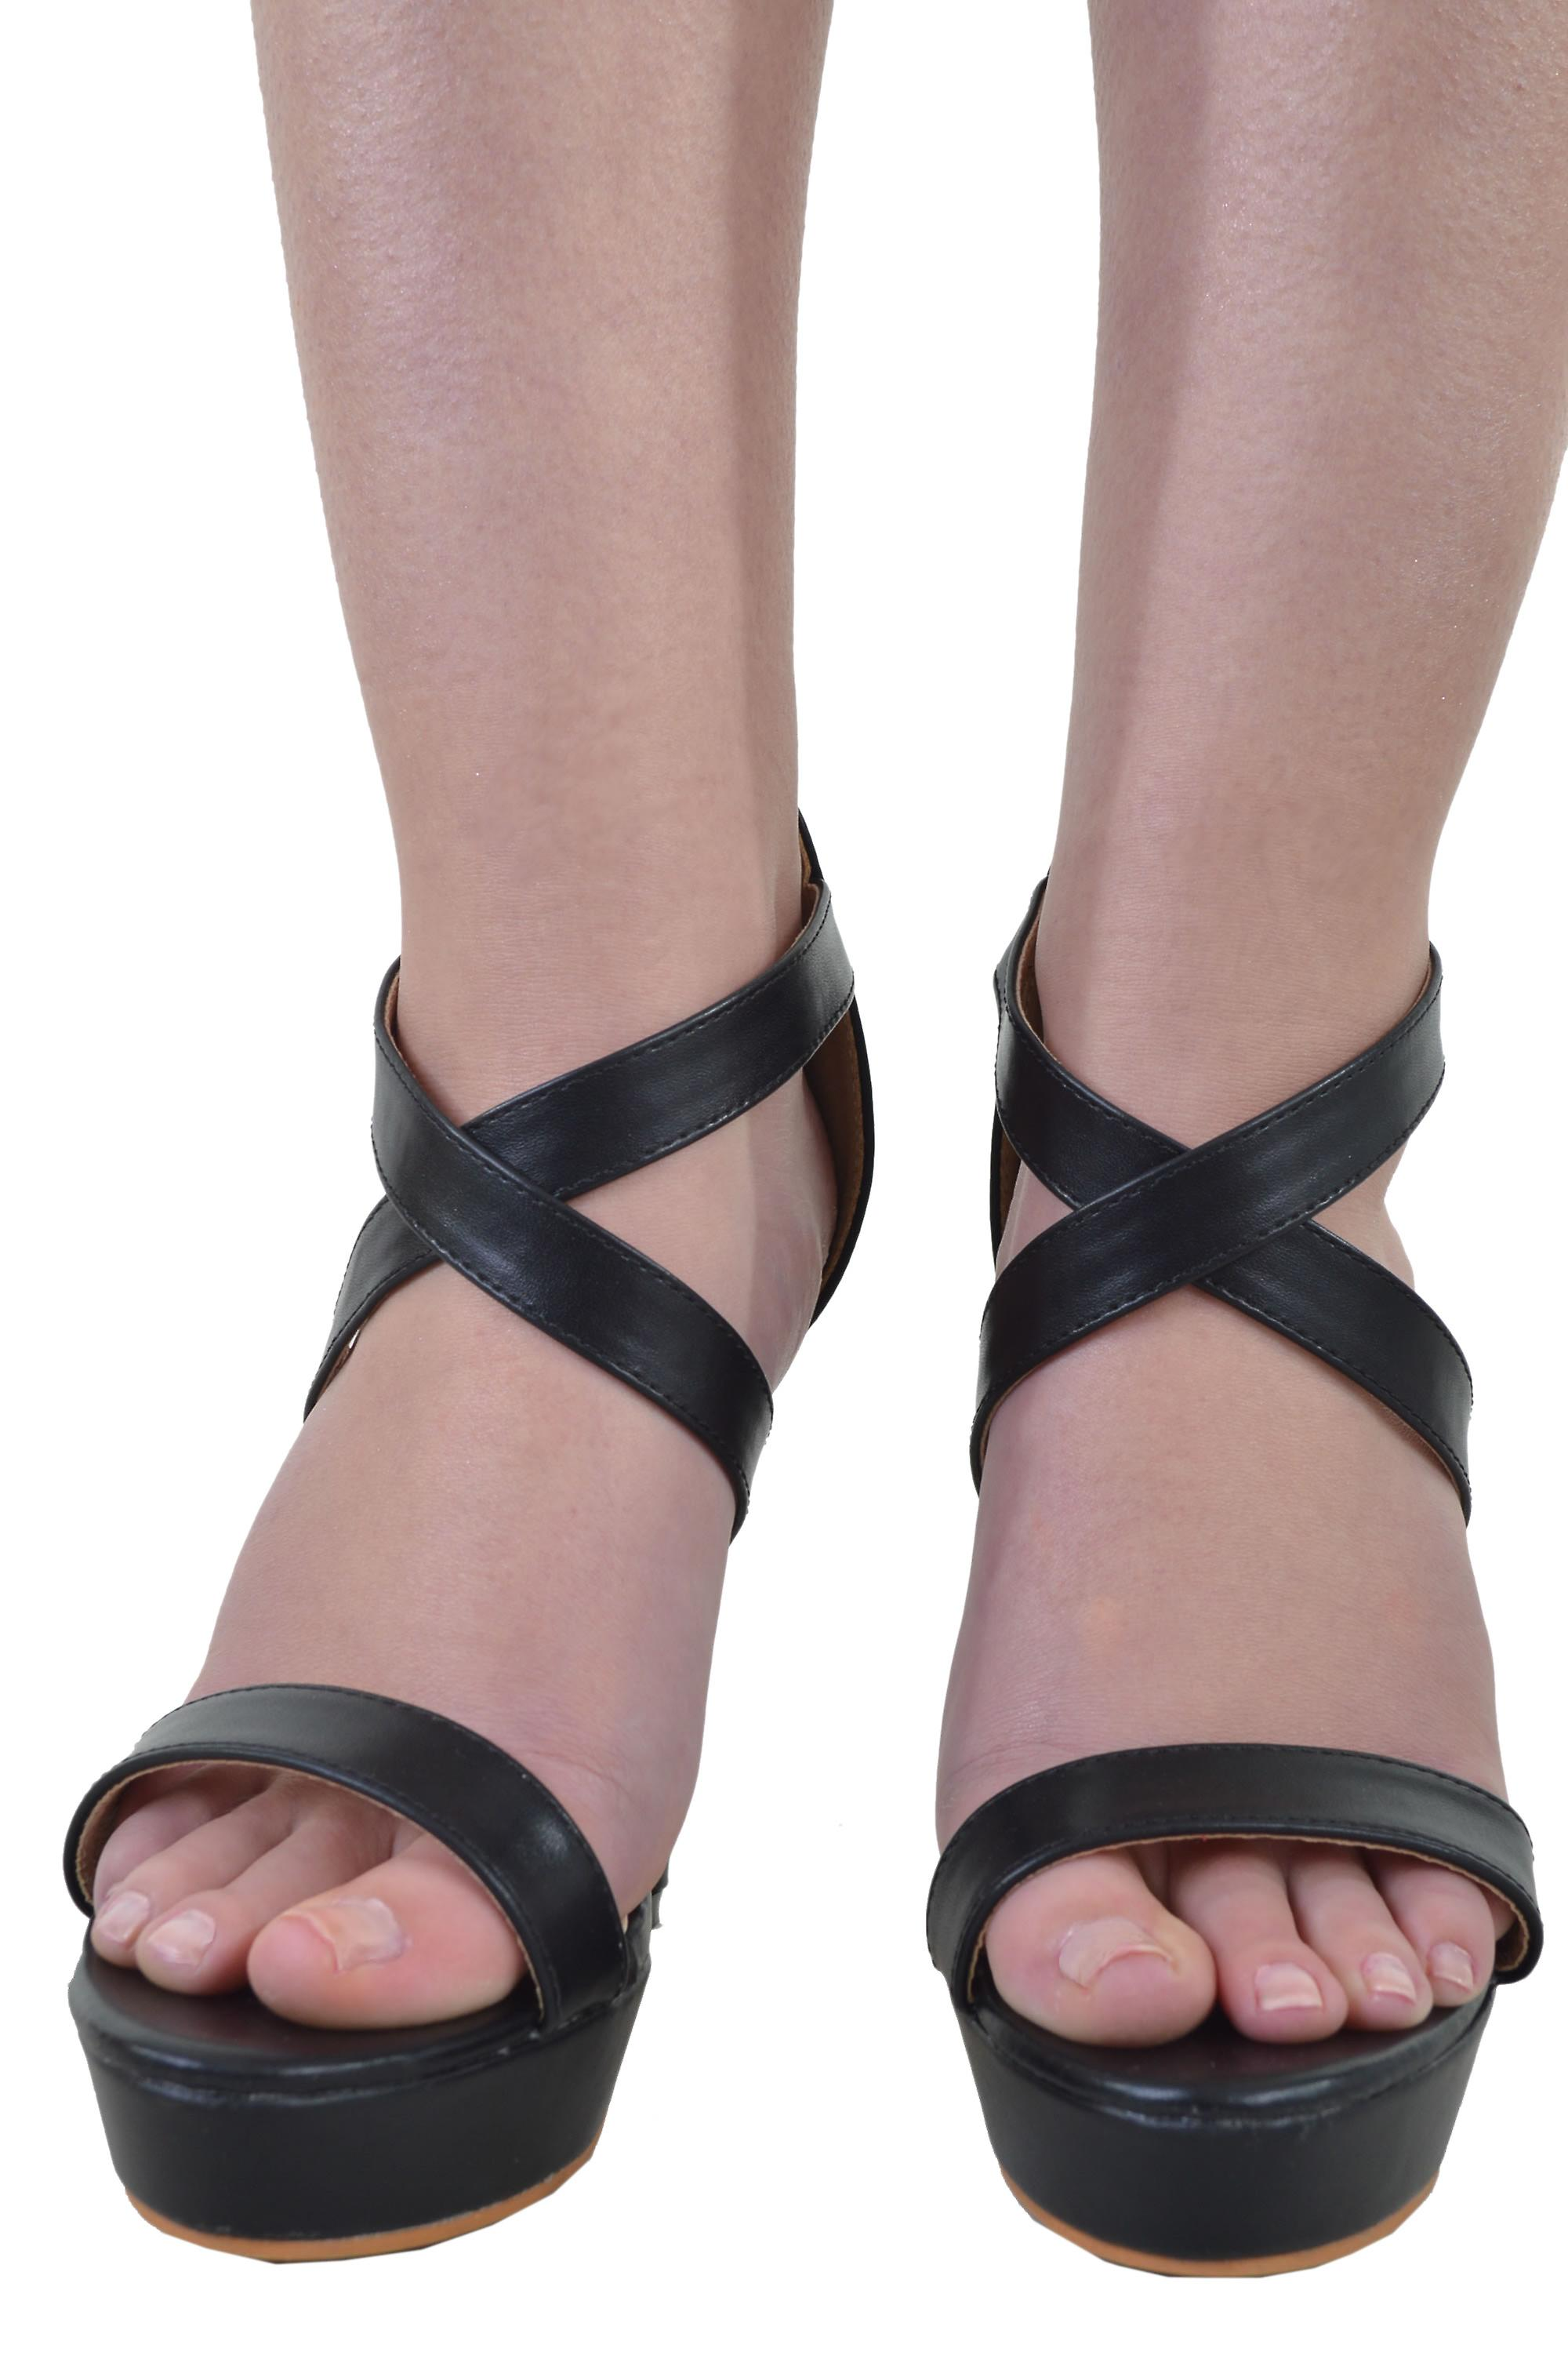 LMS Platform Heels With Criss-Cross Straps In Black